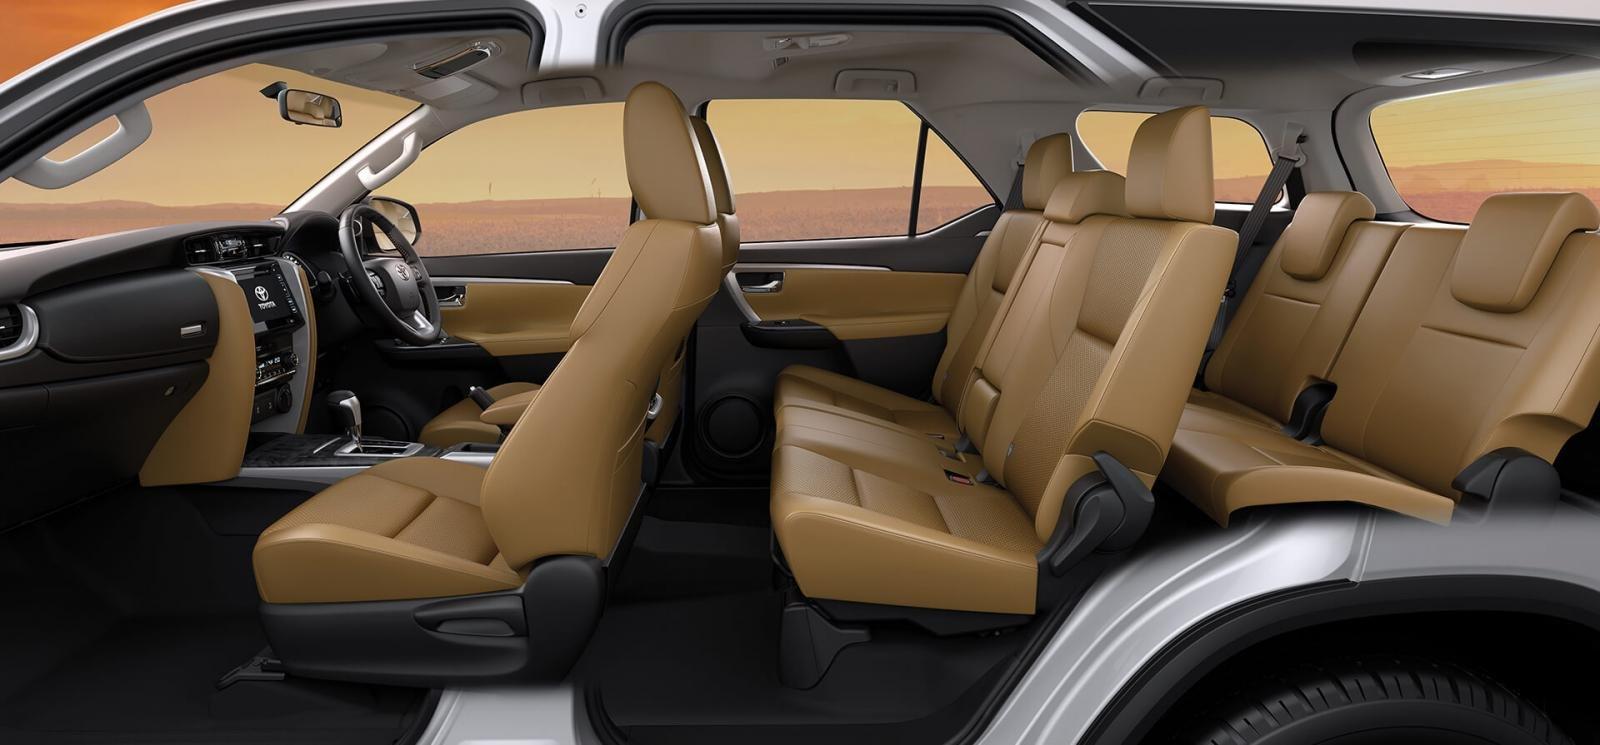 Nội thất xe Toyota Fortuner 2019 cũ